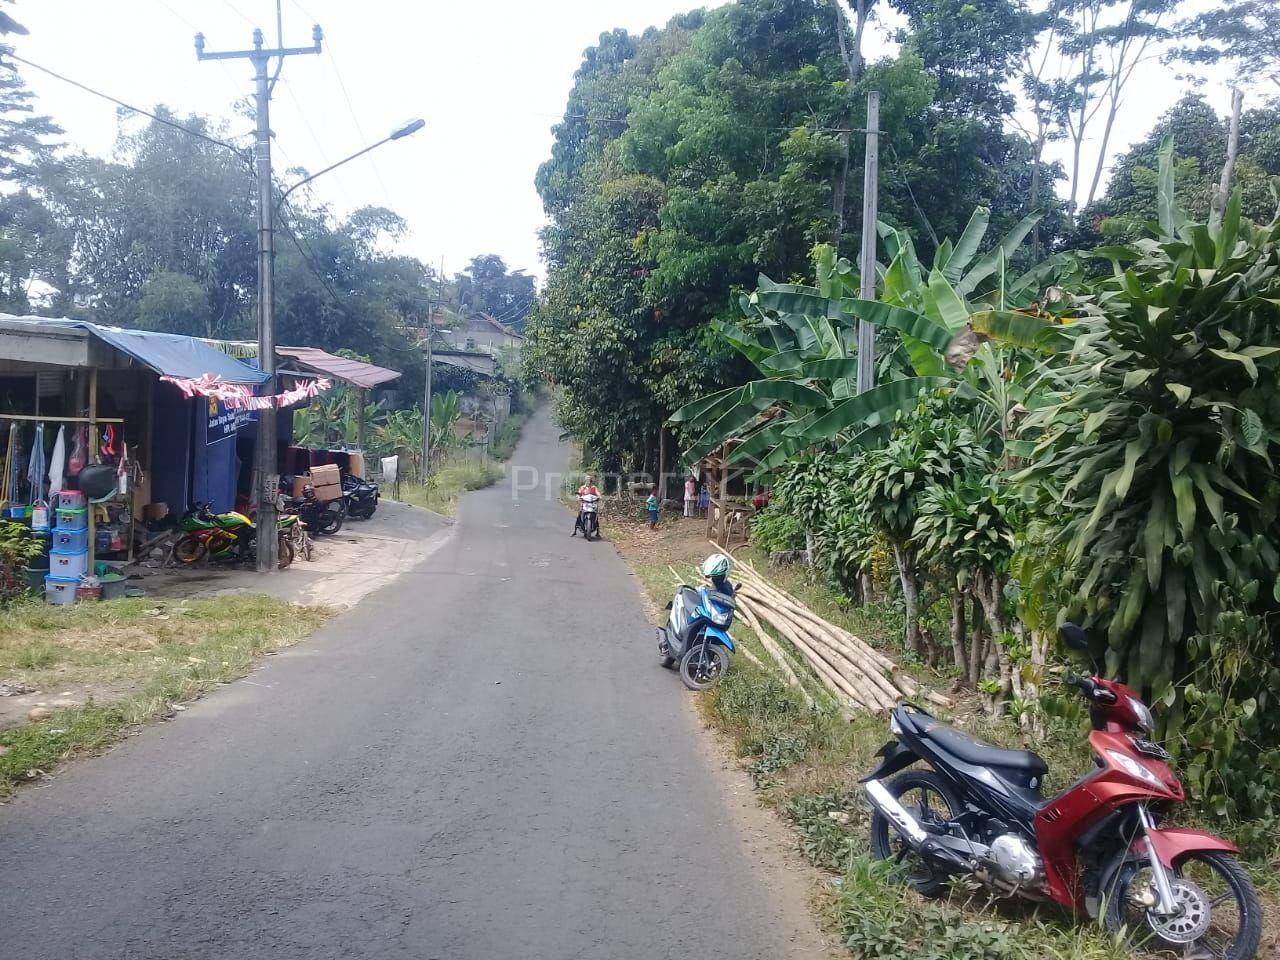 Land 5.5 Ha Allocation of Housing in Sukajadi, Bogor, Kab. Bogor